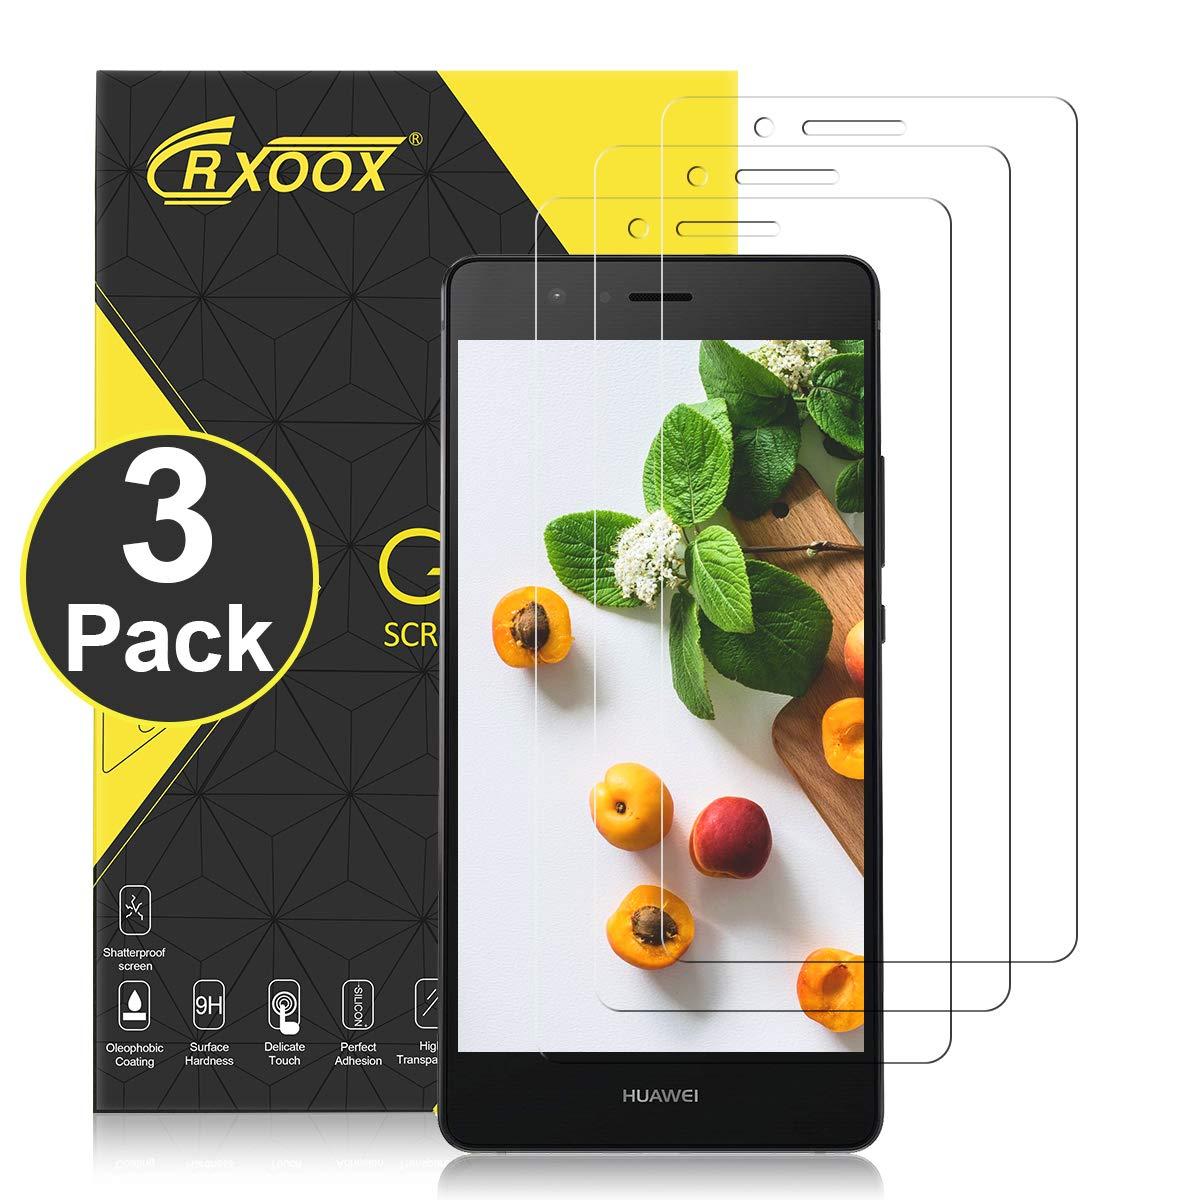 CRXOOX Protector Pantalla para Huawei P9 Lite, 3-Unidades, 9H Dureza, Alta Definicion, Anti-petróleo, Anti-Burbuja, 0.33mm, 2.5D Round Edge: Amazon.es: ...